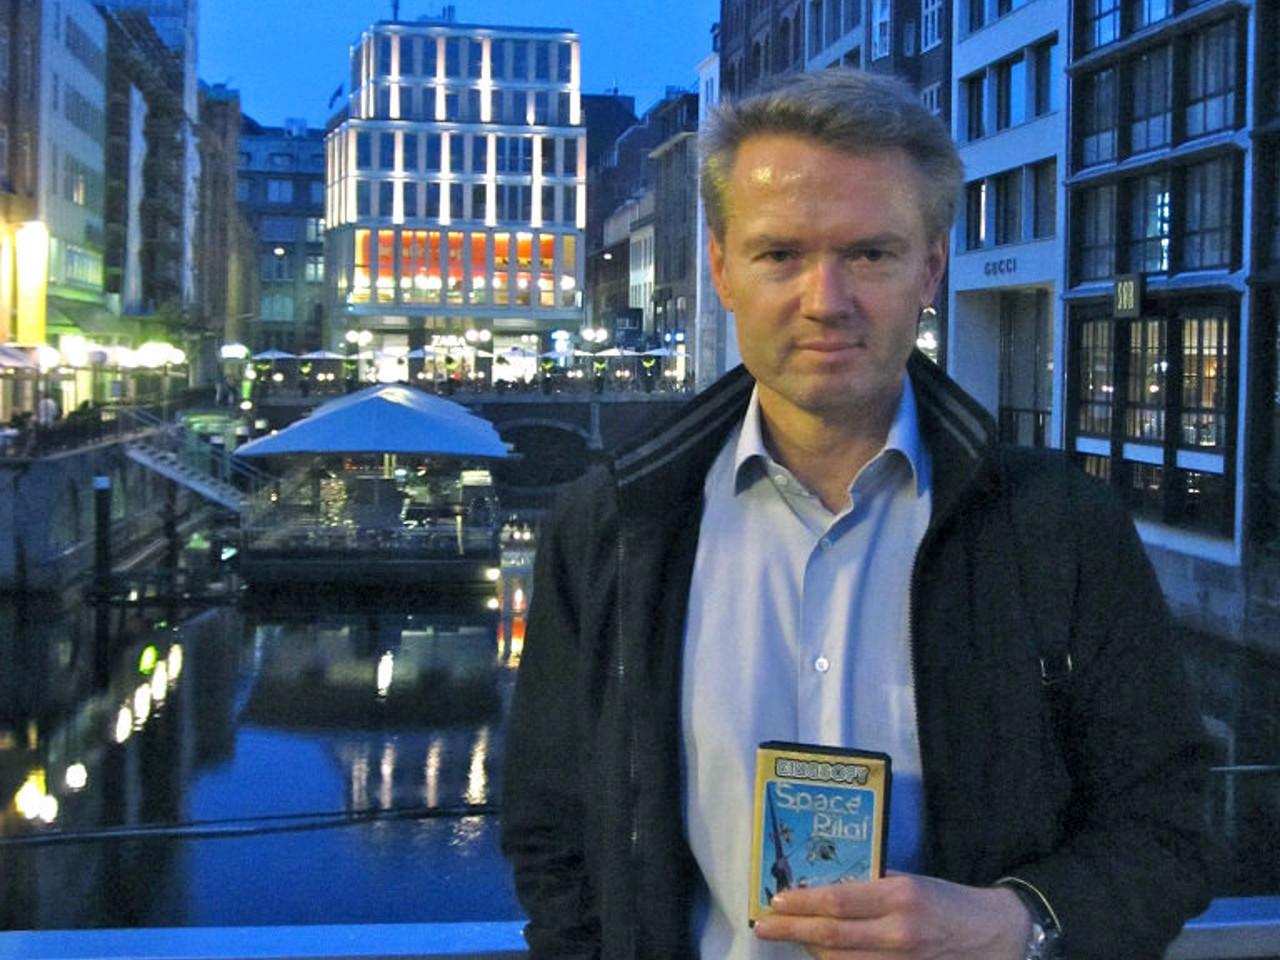 Henrik Wening im Sommer 2011 in Hamburg. (Bild: André Eymann)